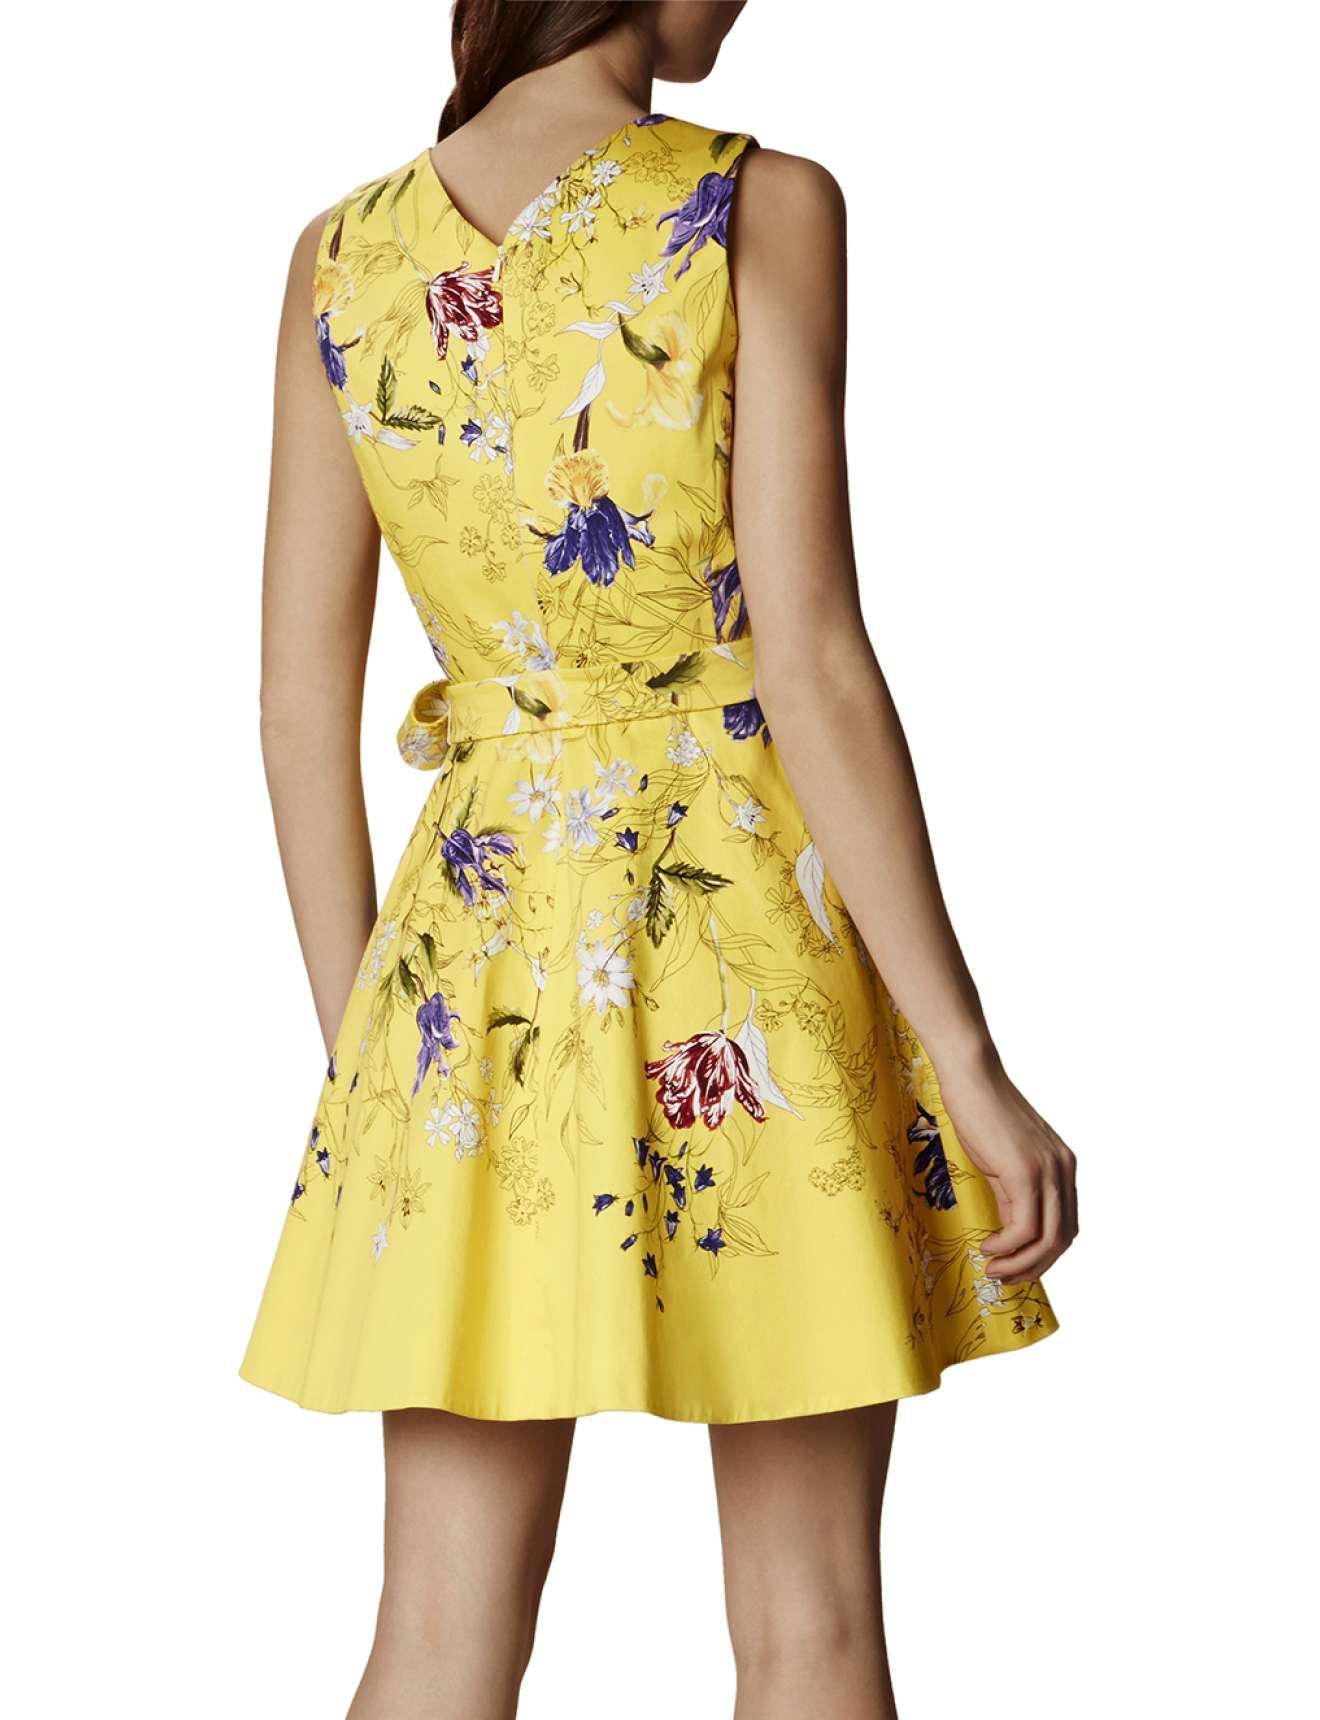 Lyst karen millen yellow floral a line dress yellowmulti in yellow gallery womens yellow dresses mightylinksfo